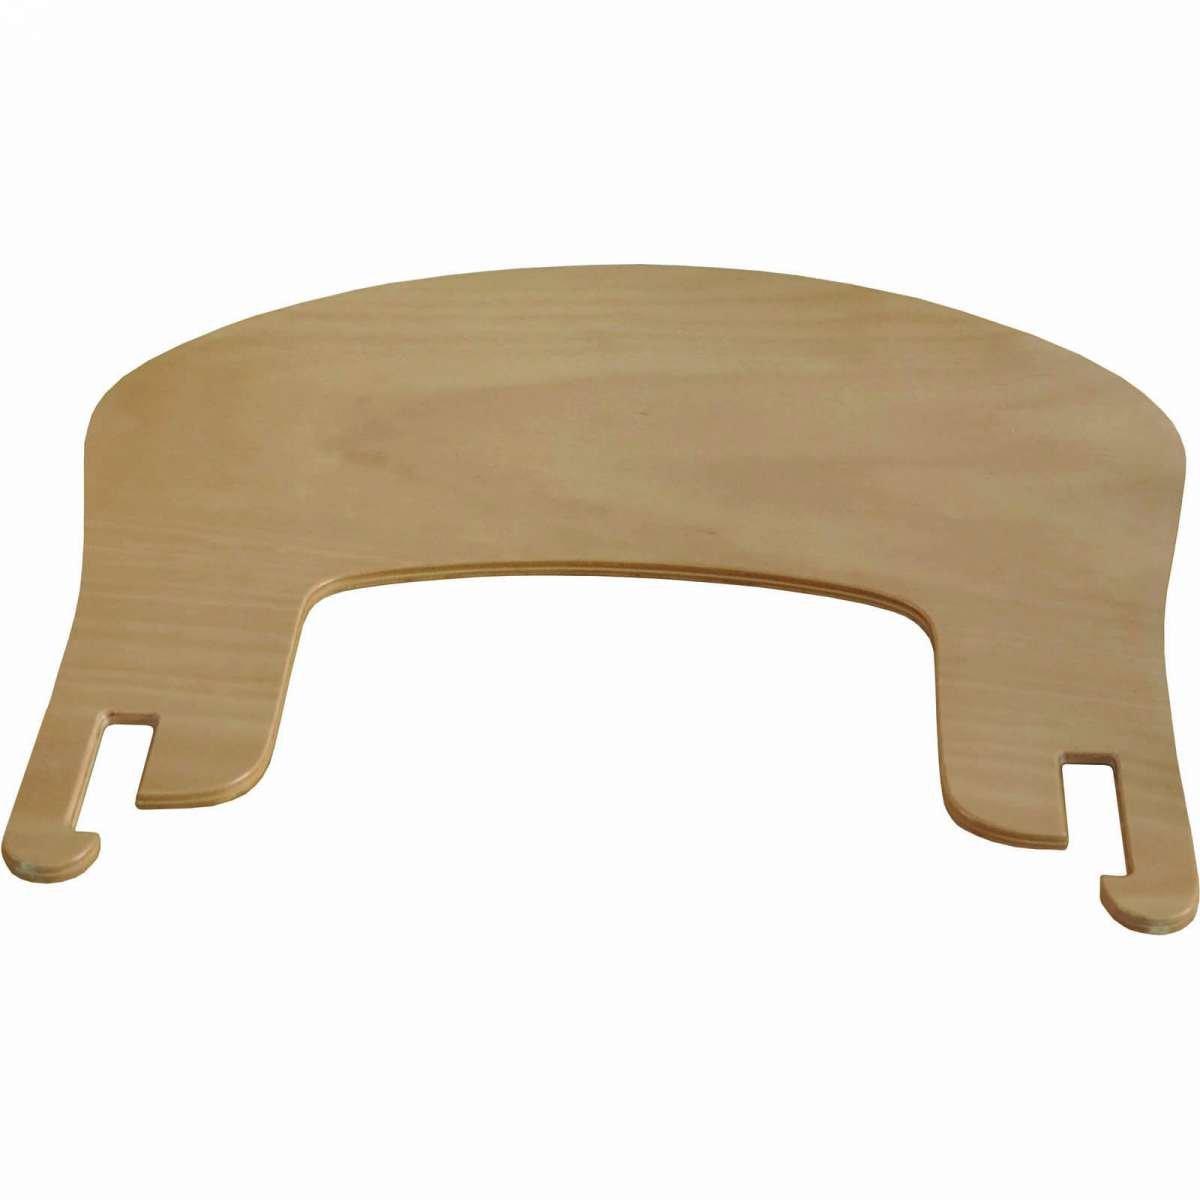 Fillikid Tabel plate Barošanas krēsla MAX paplāte